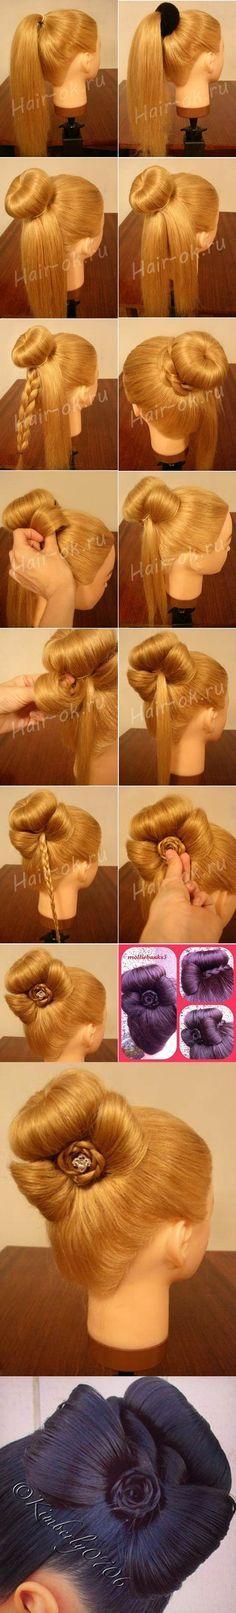 DIY Elegant Bun Decorated with a Bow   iCreativeIdeas.com Like Us on Facebook ==> https://www.facebook.com/icreativeideas